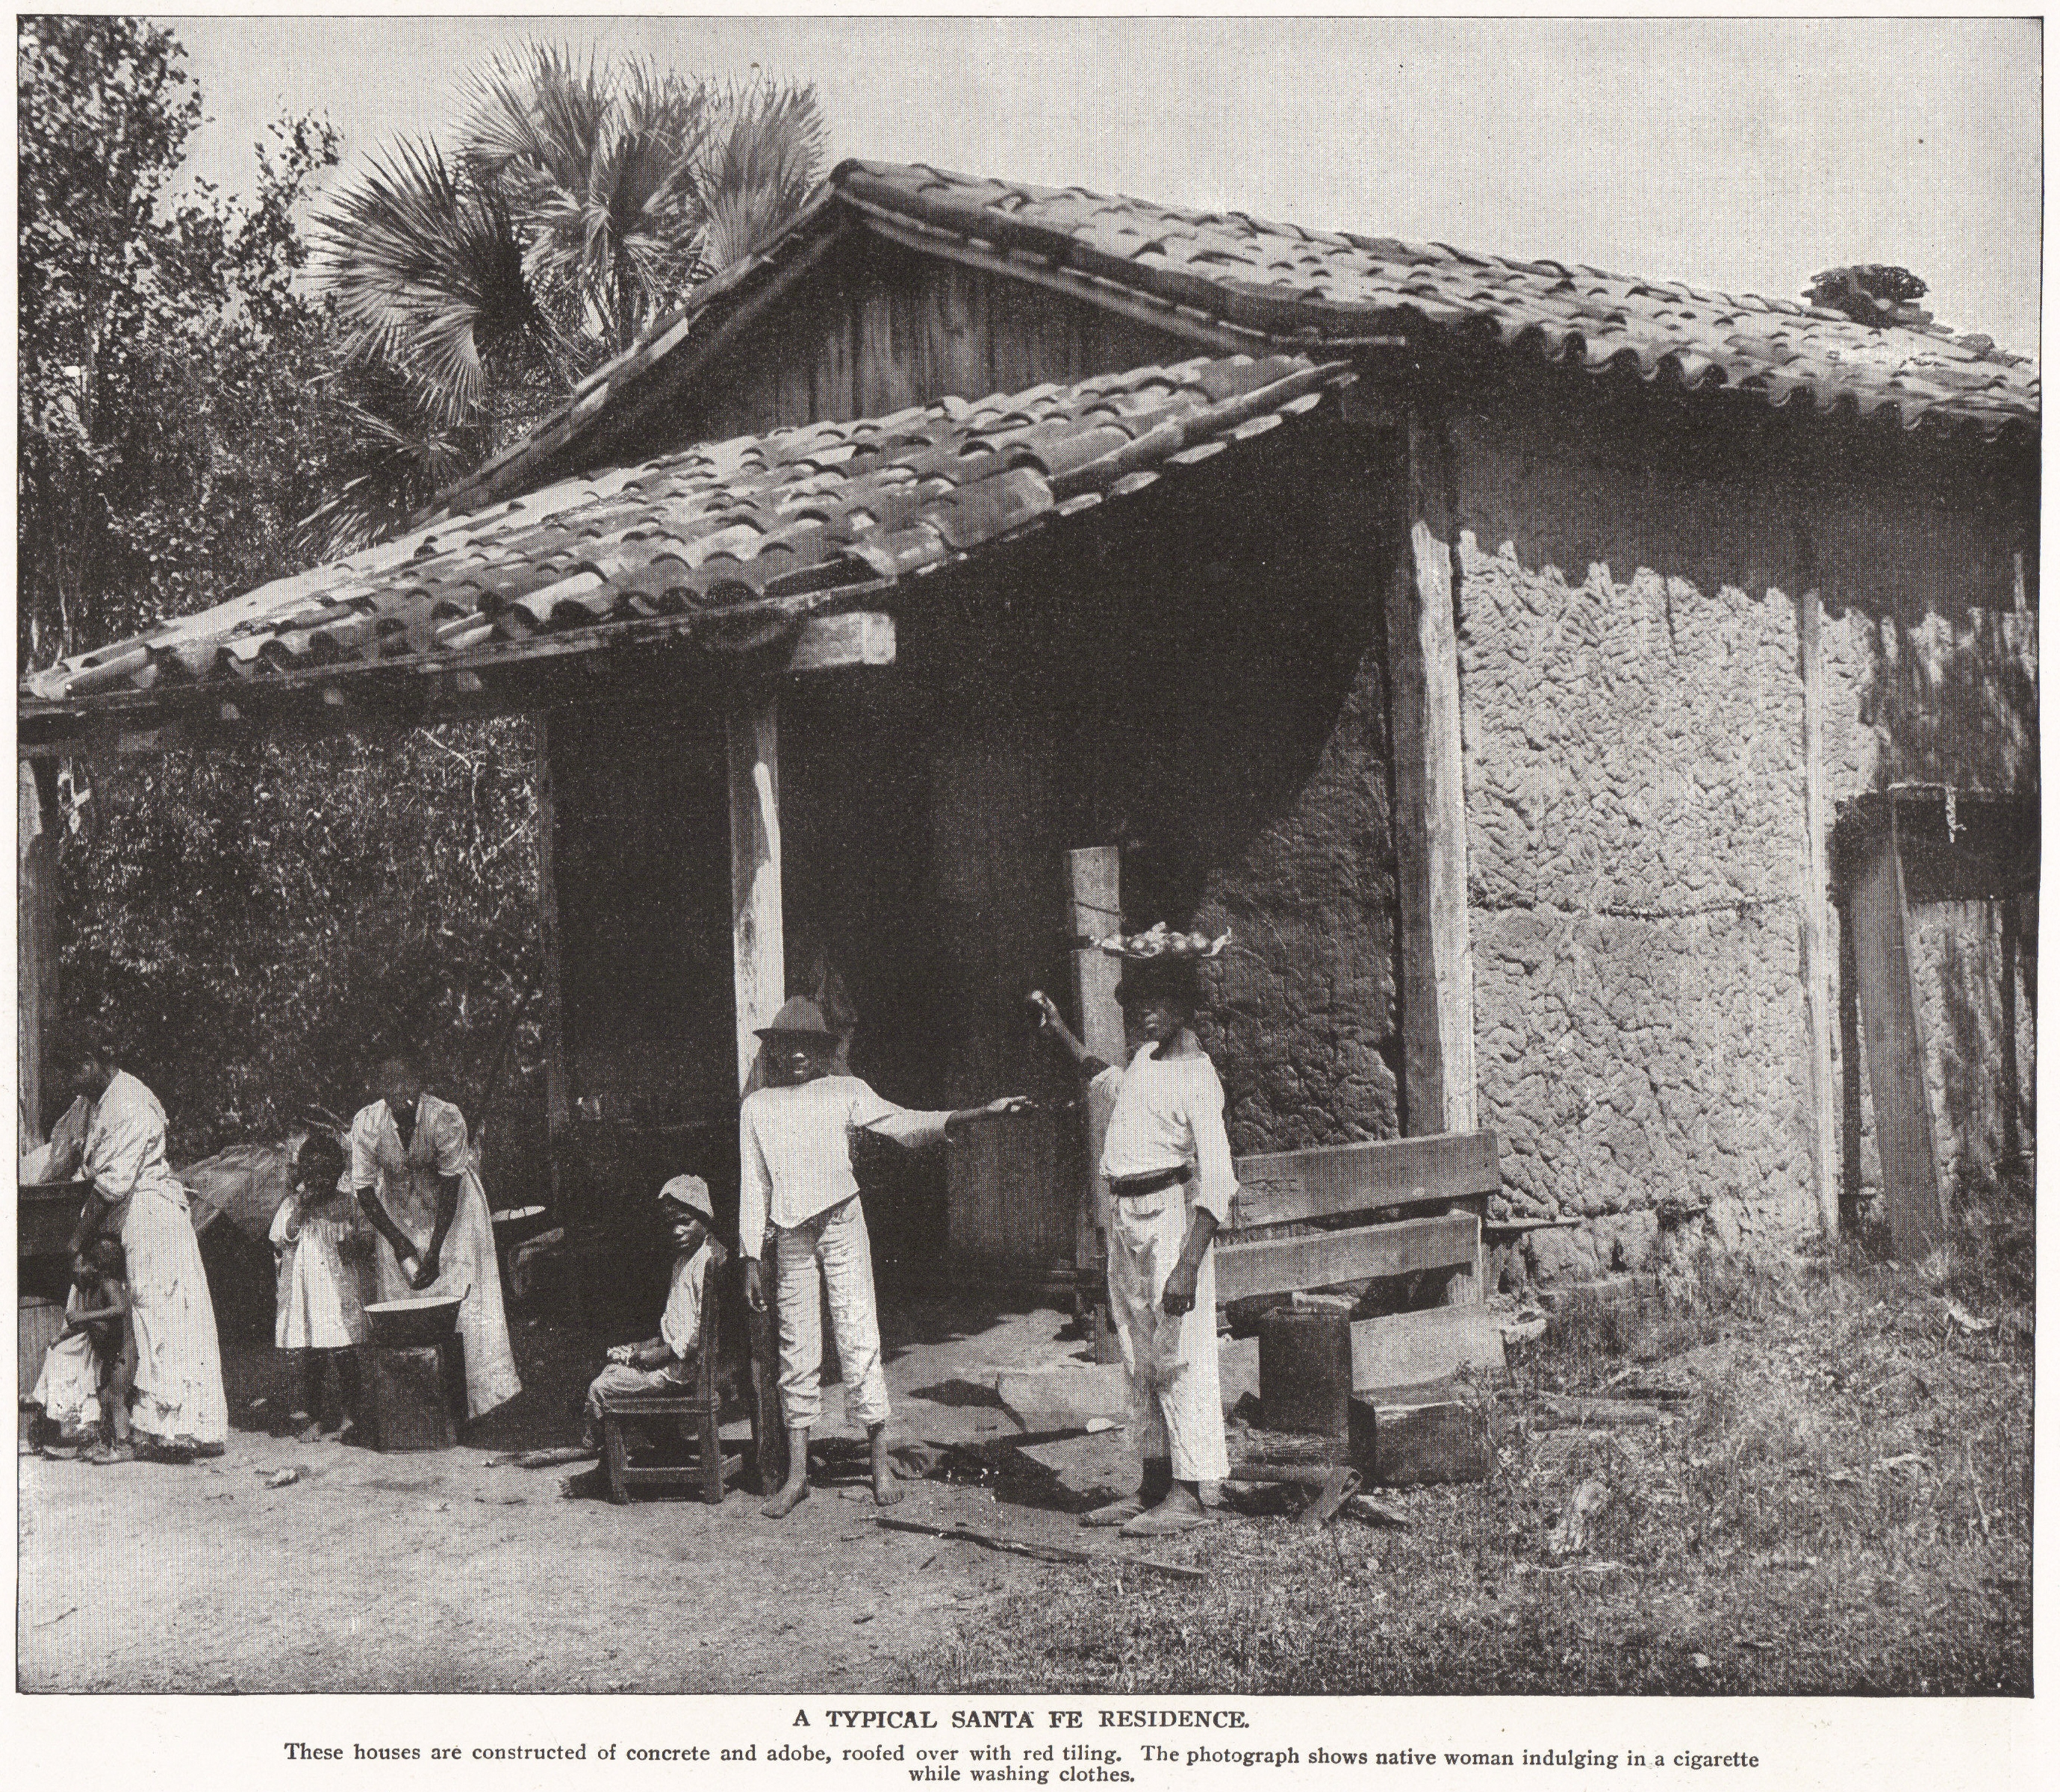 Typical Santa Fe Residence (Cuba, 1898)